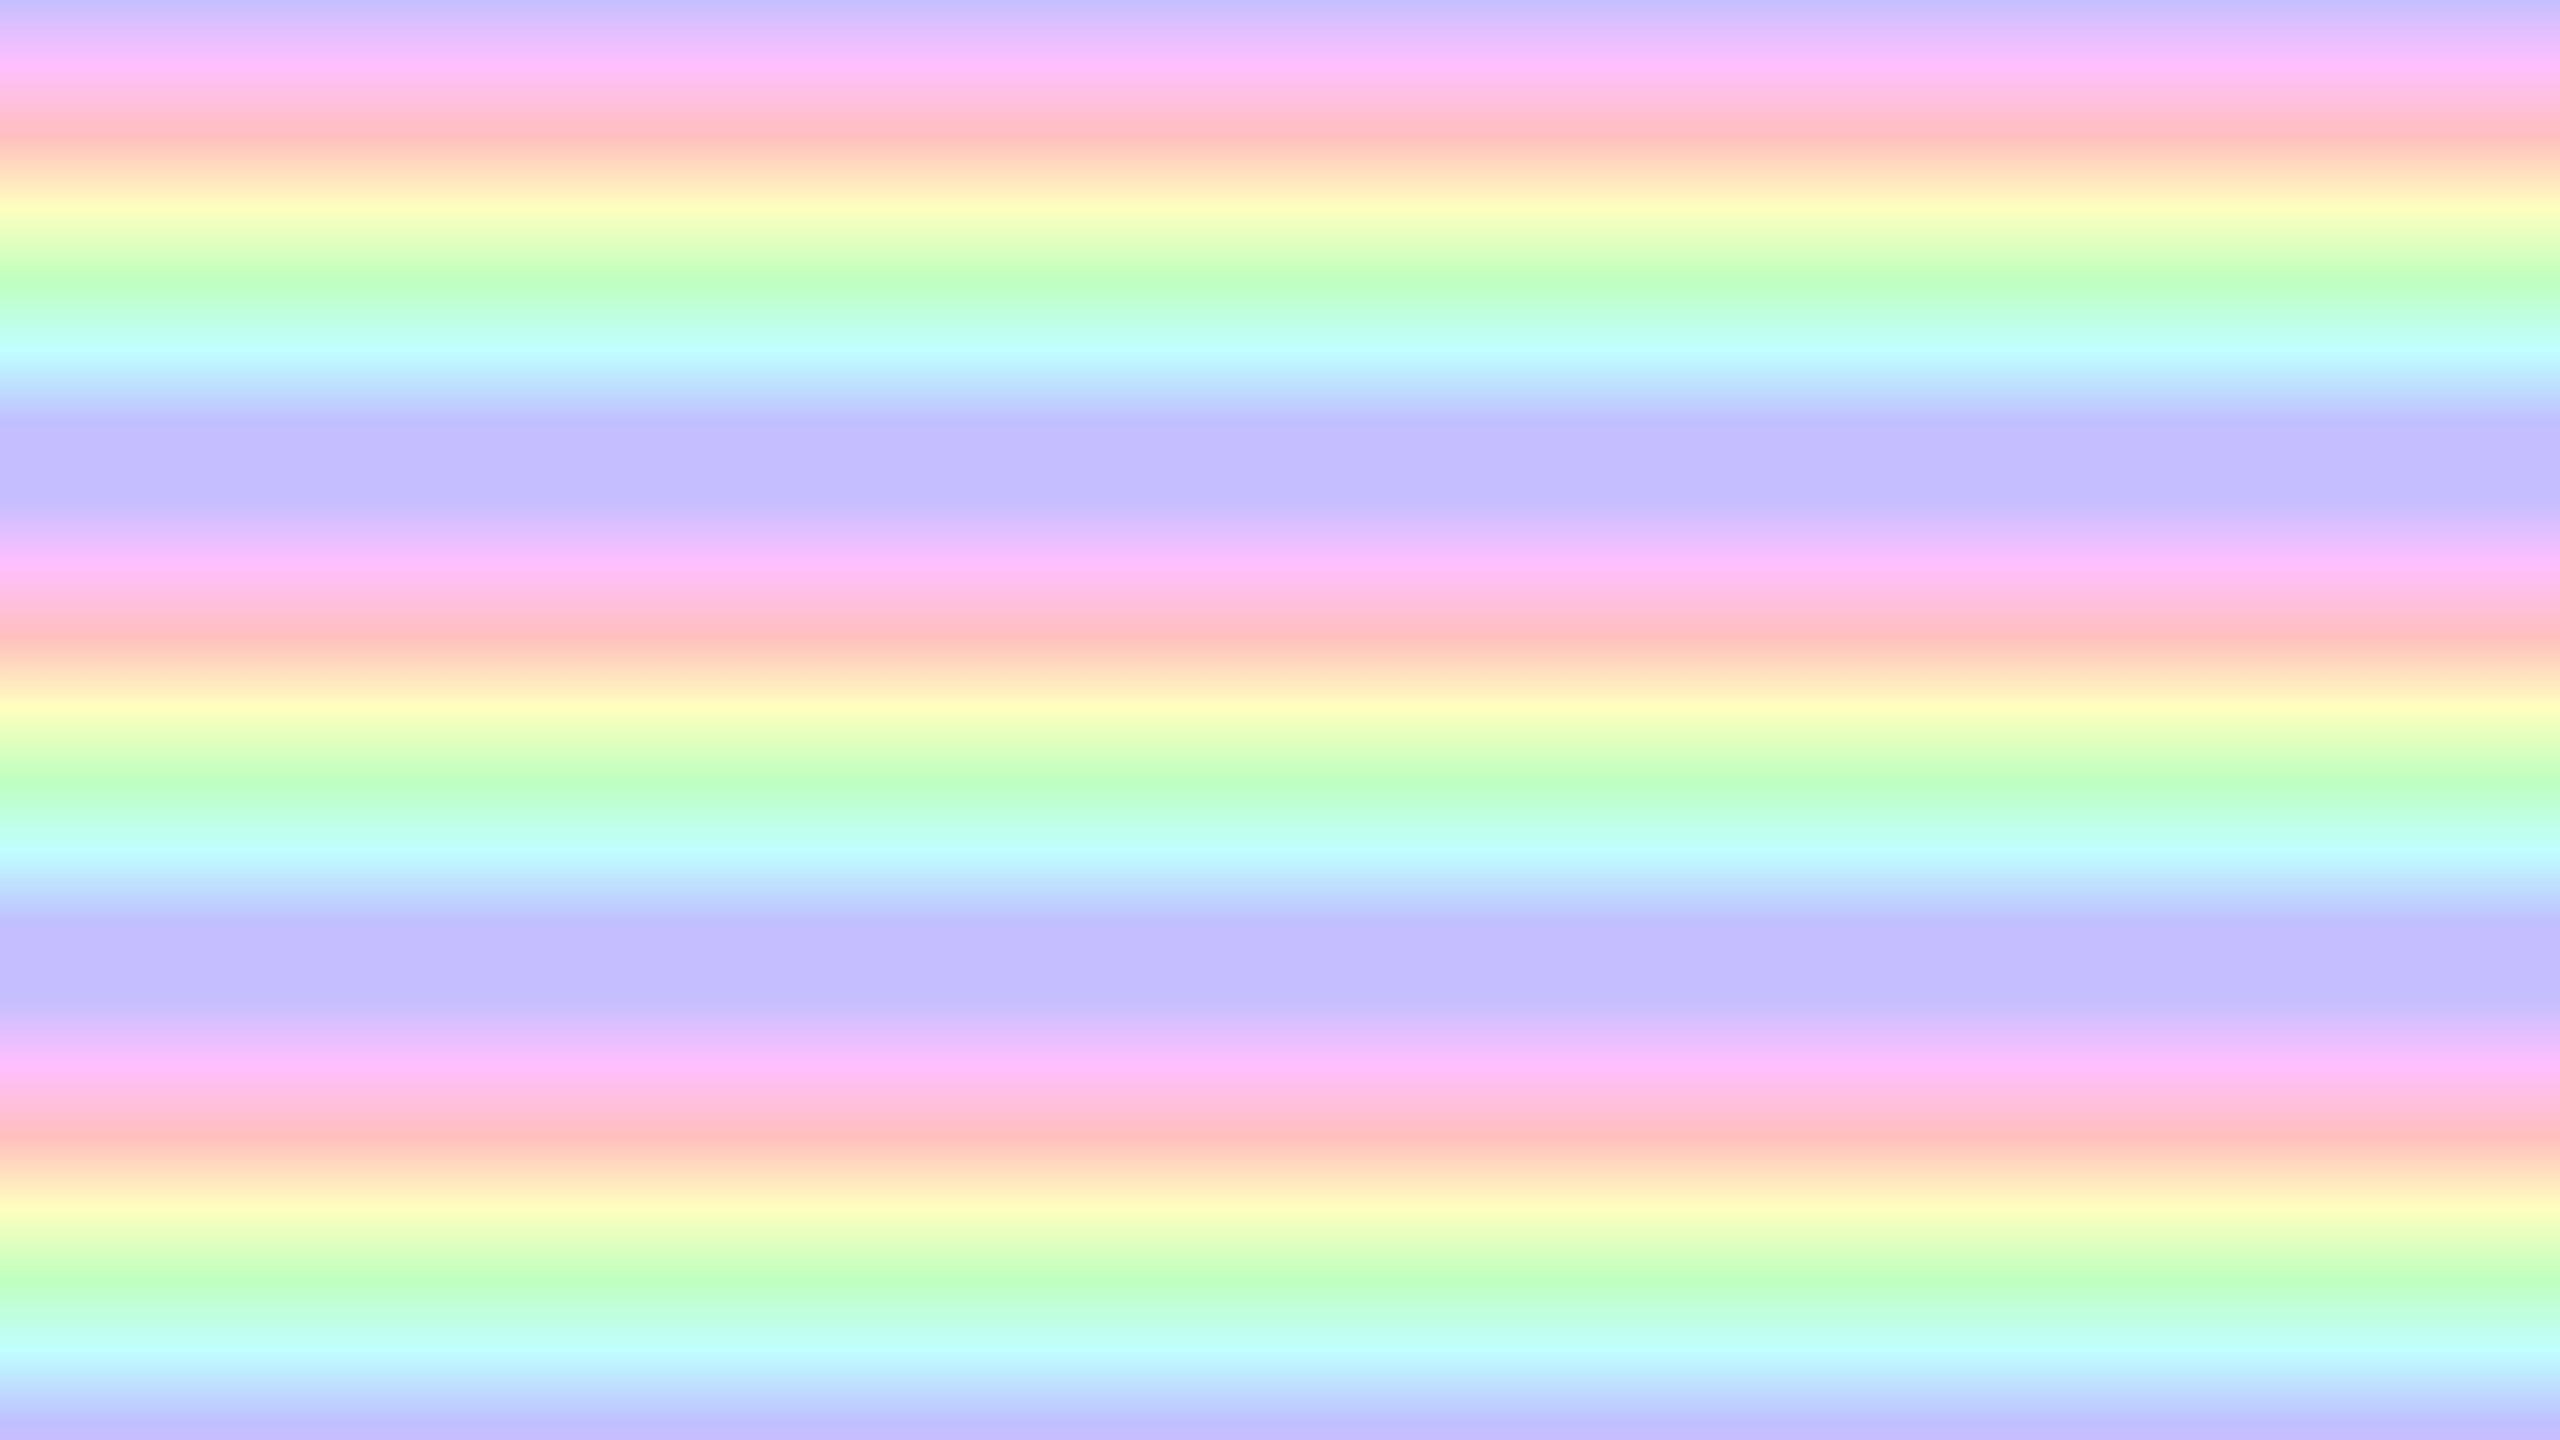 2560x1440 Channel Art Maker For Girls Rainbow Scroll Desktop